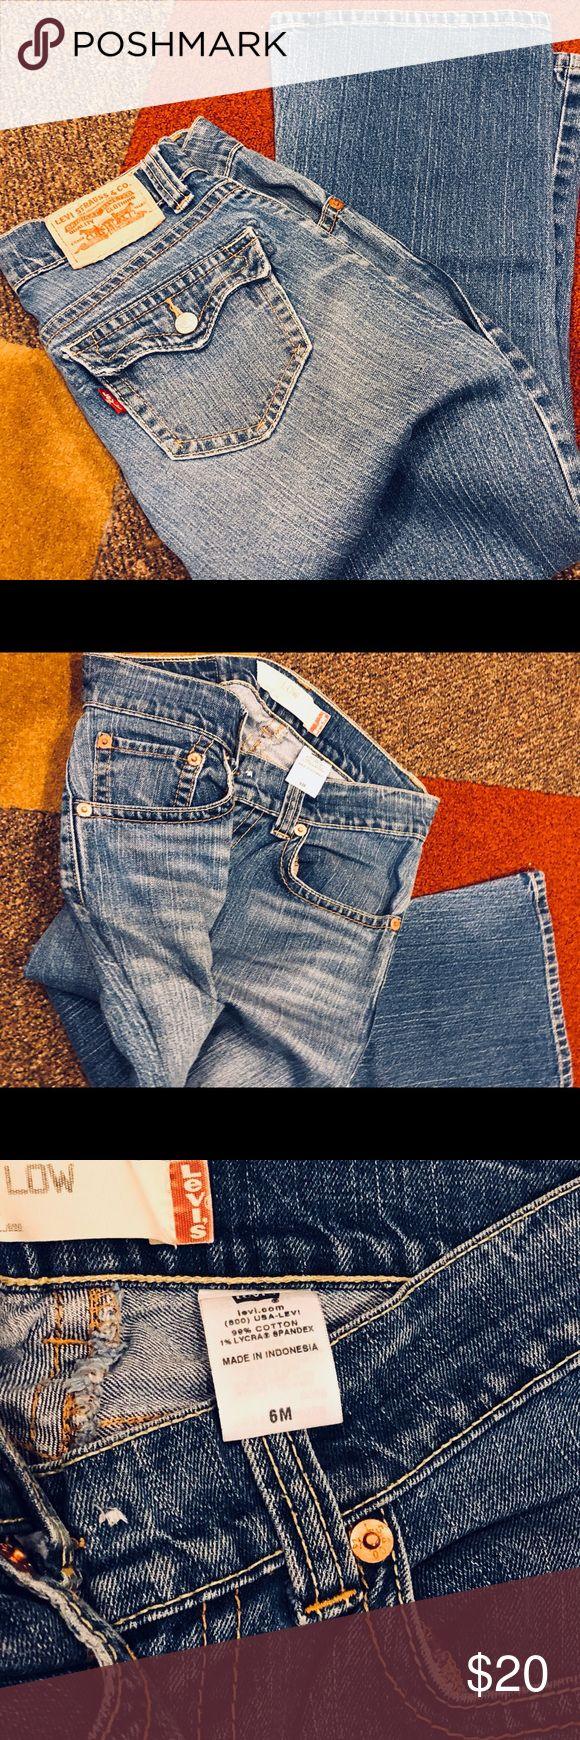 Levi's bootcut jeans Great Levi's boot cut jeans. Size 6 regular. Low cut and bootcut. Levi's Jeans Boot Cut